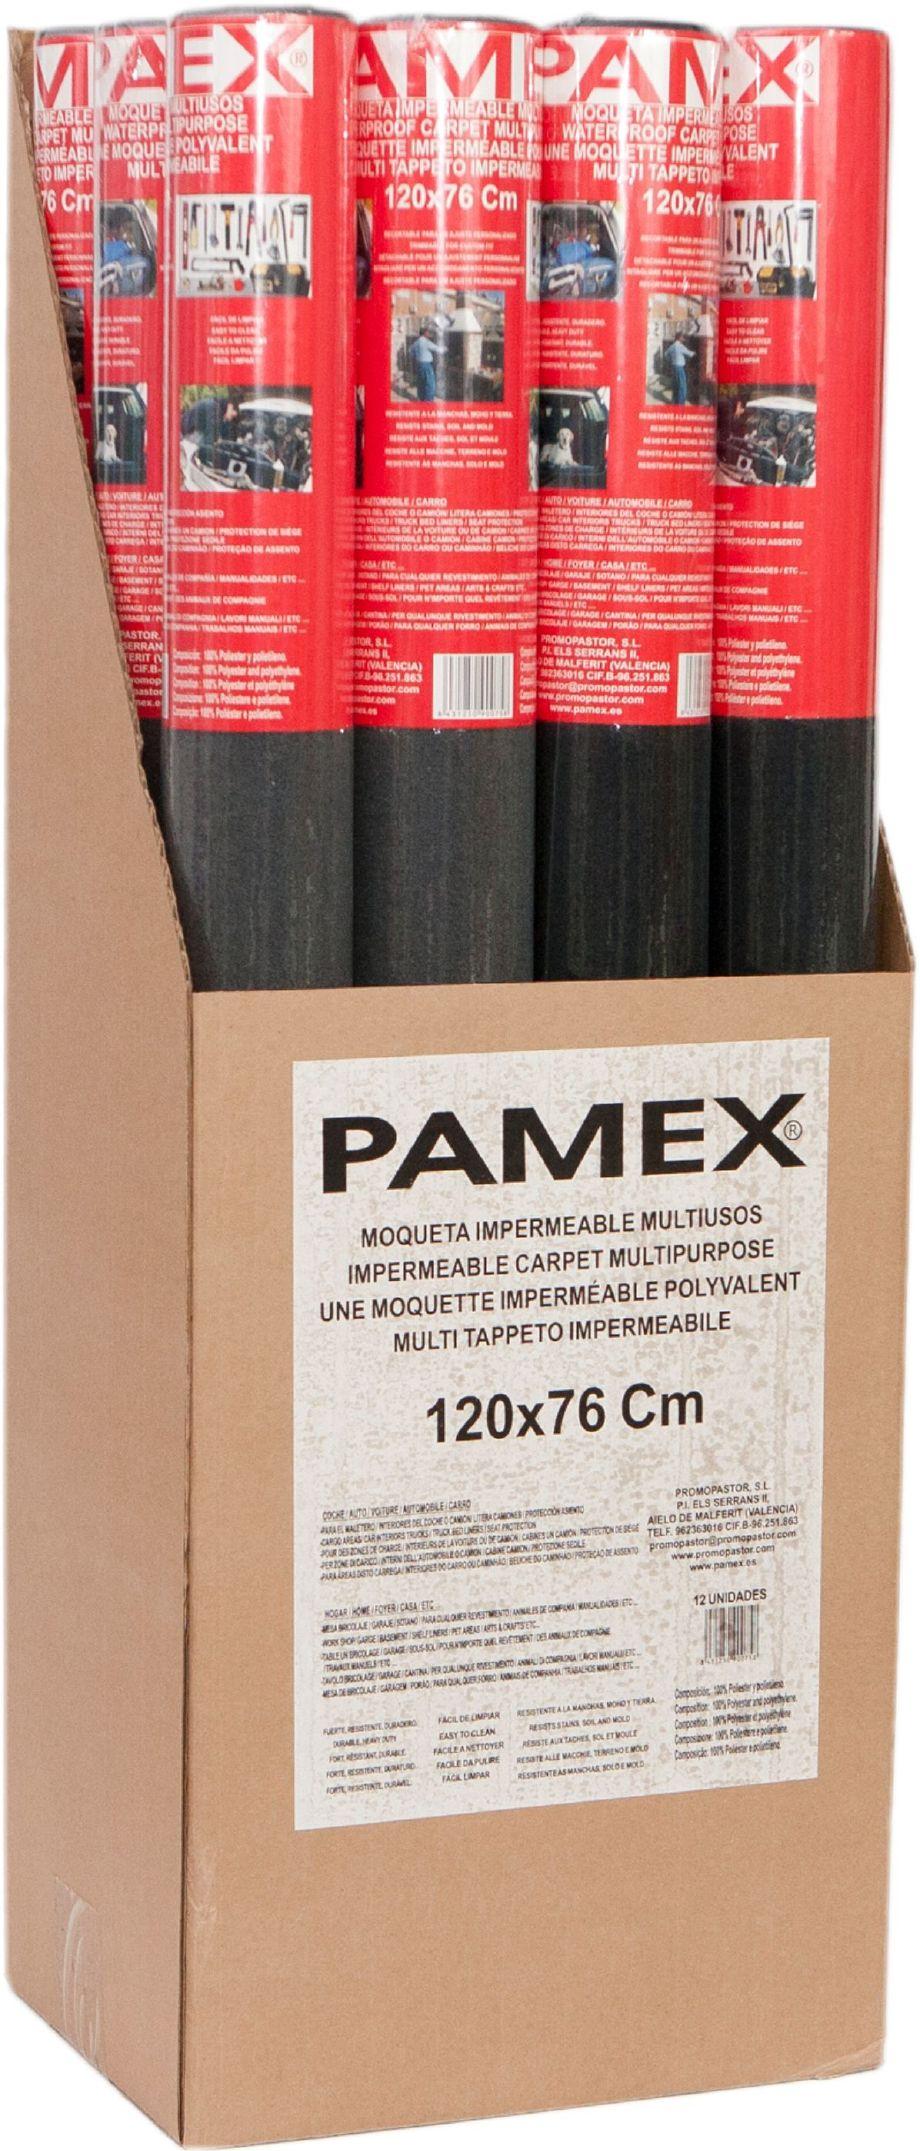 MOQUETA IMPERMEABLE 120 X 76 PAMEX